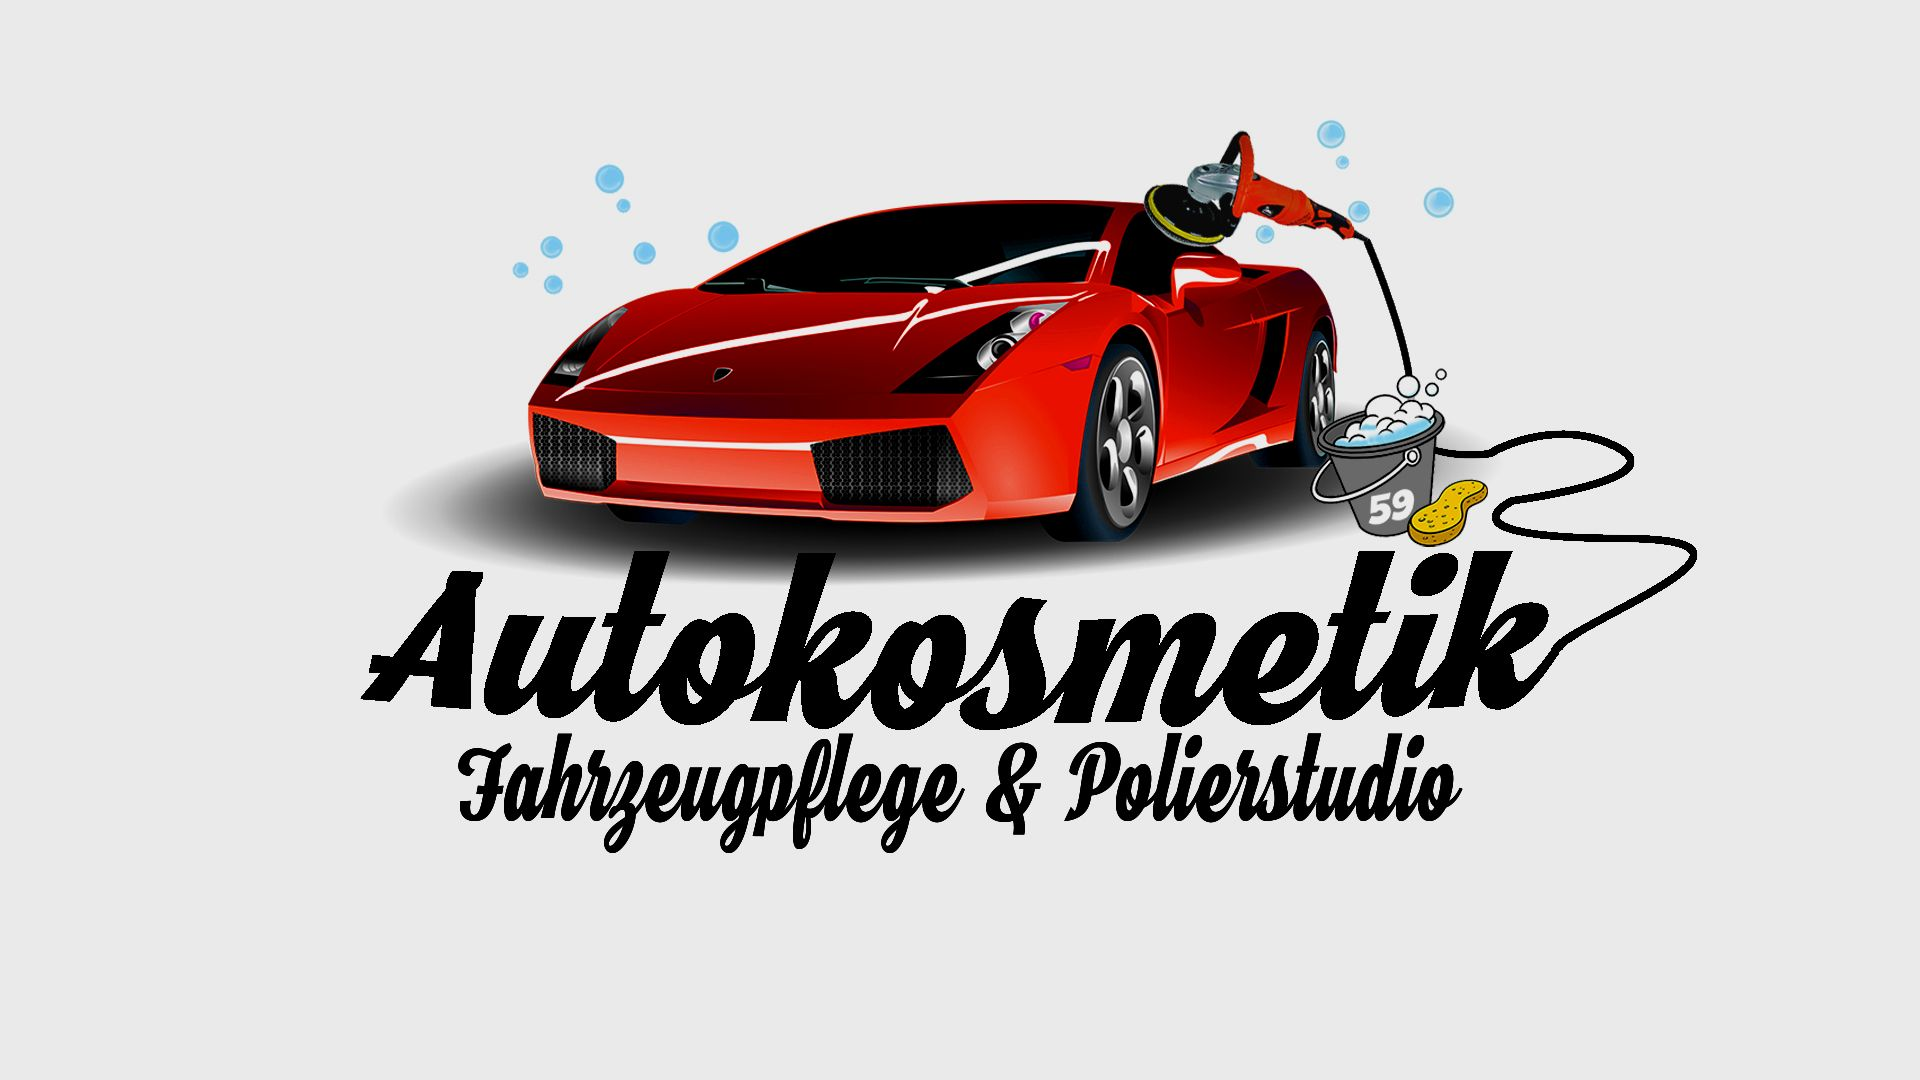 Autokosmetik59